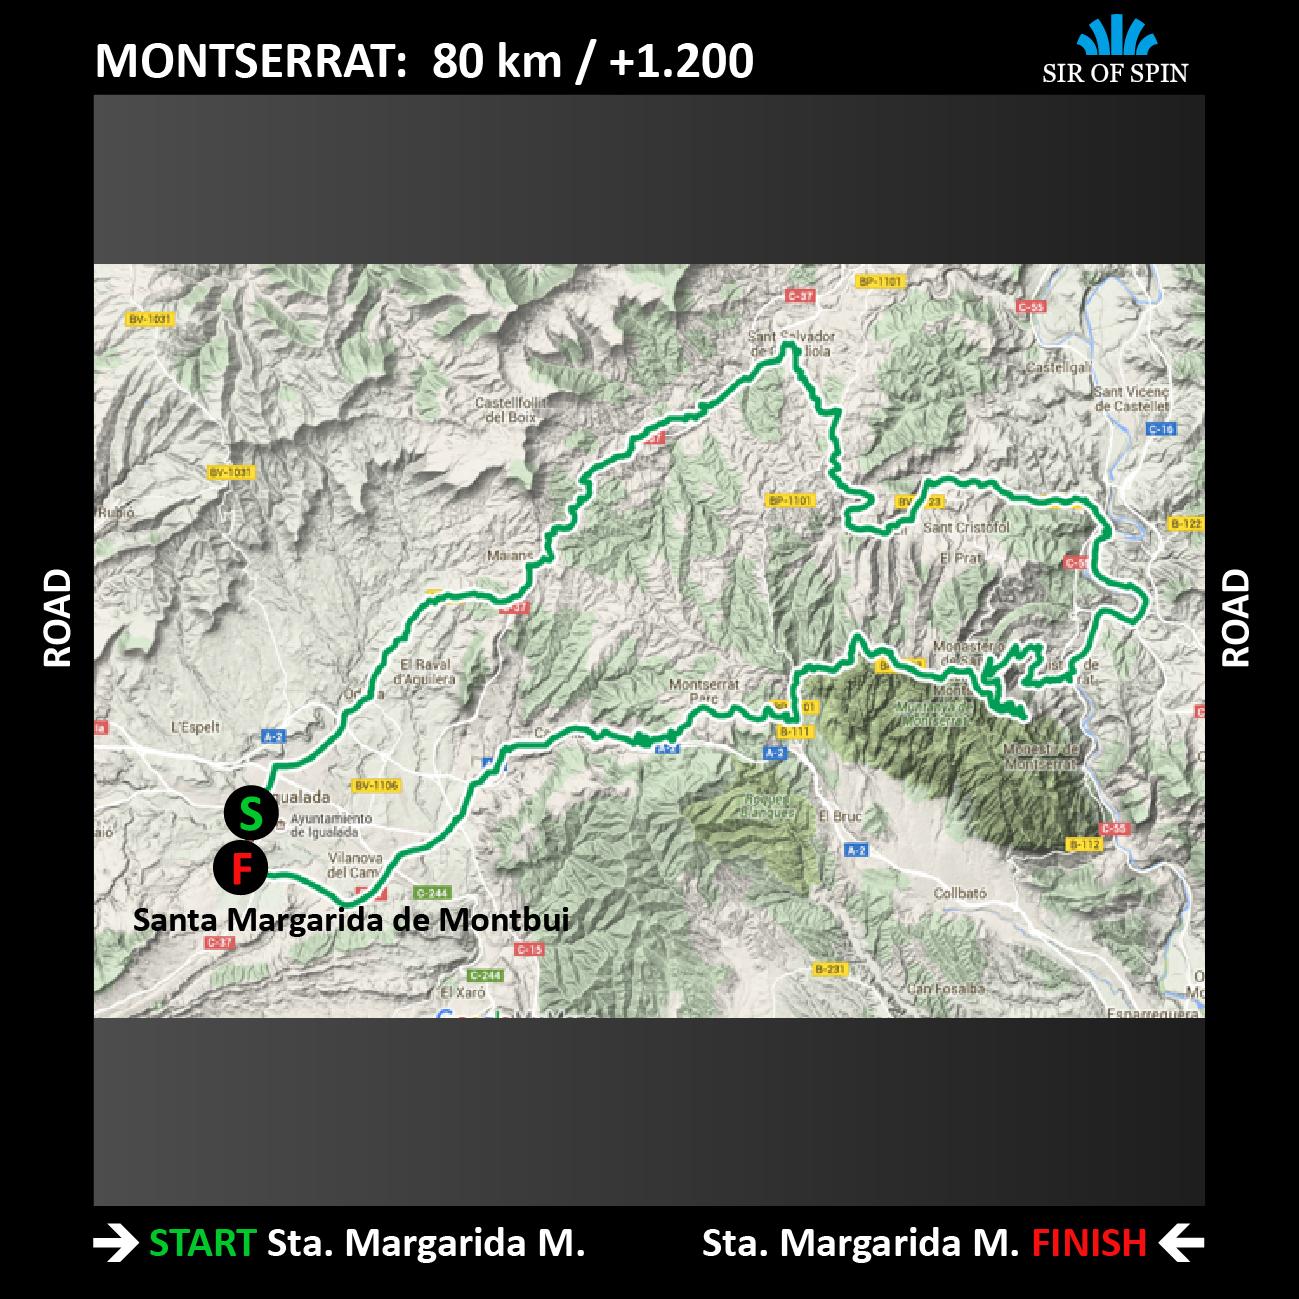 Mapa ruta MONTSERRAT ROAD TOUR